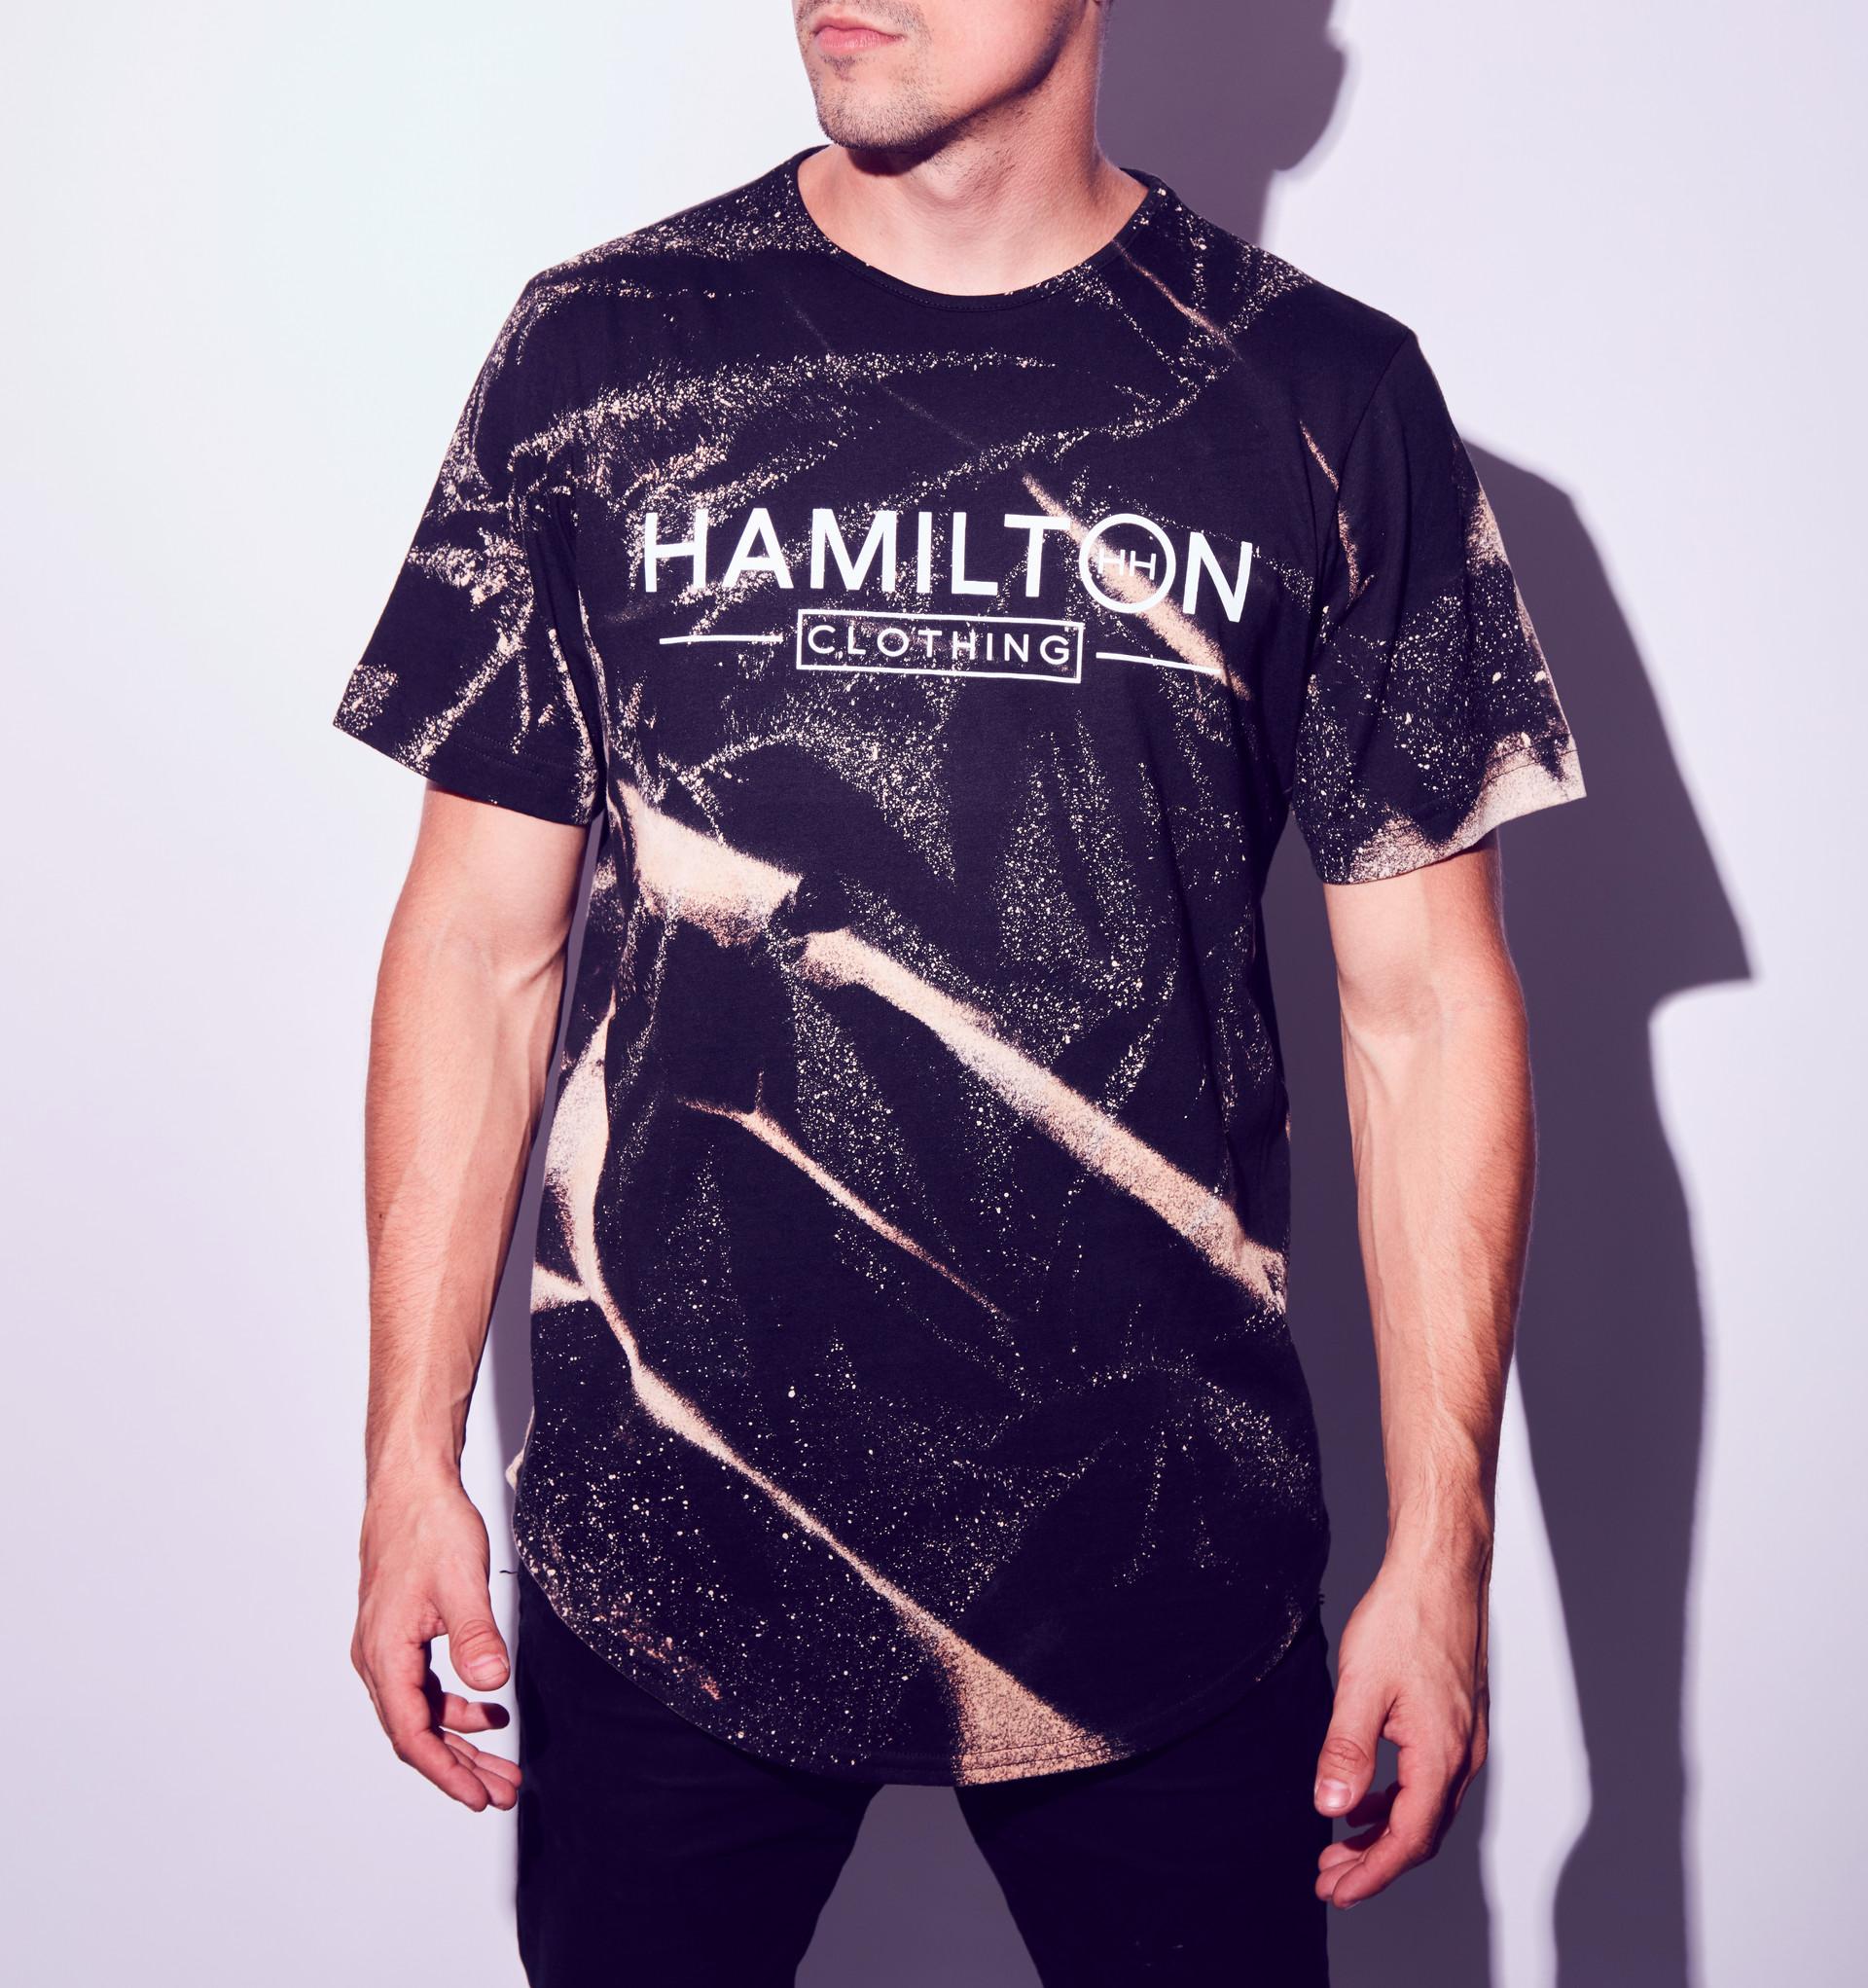 hollywood hamilton mens tshirt bleach v2 collection tampa streetwear boutique